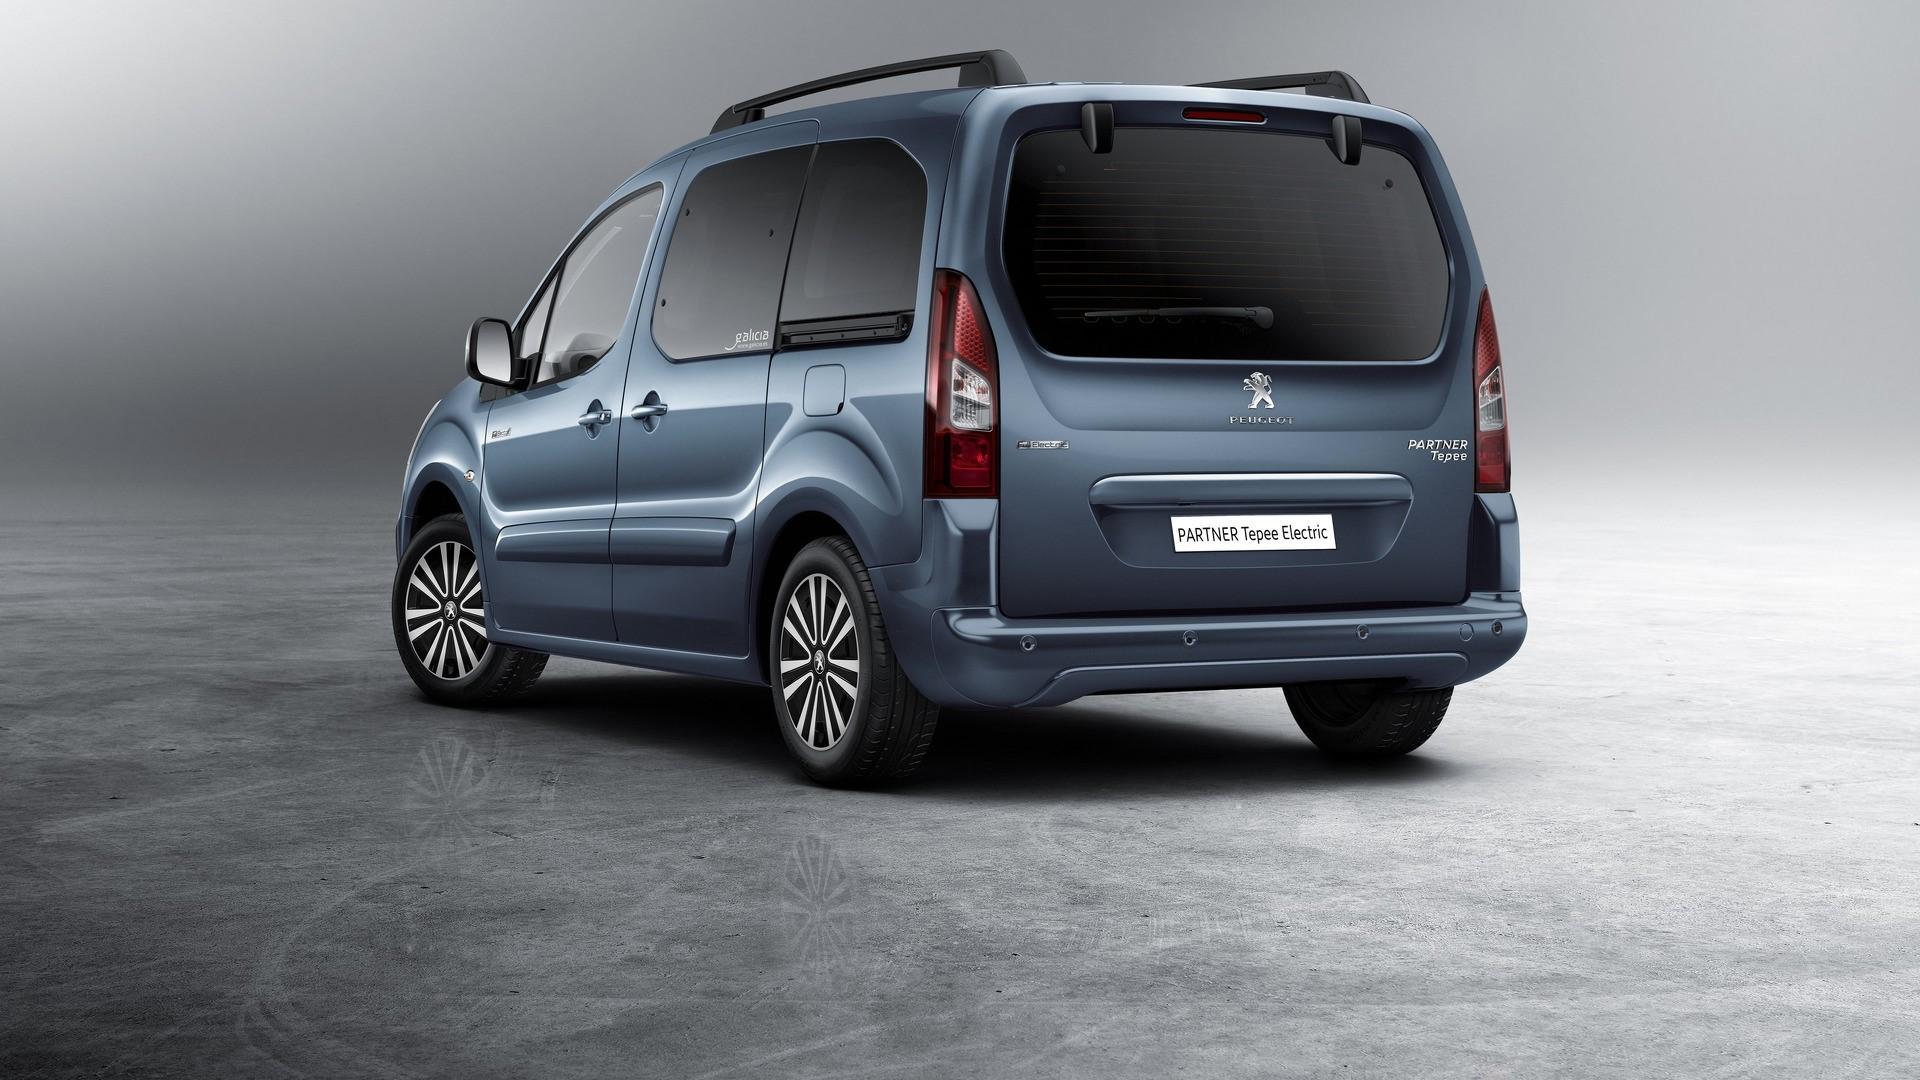 Peugeot Partner Tepee Electric (1)